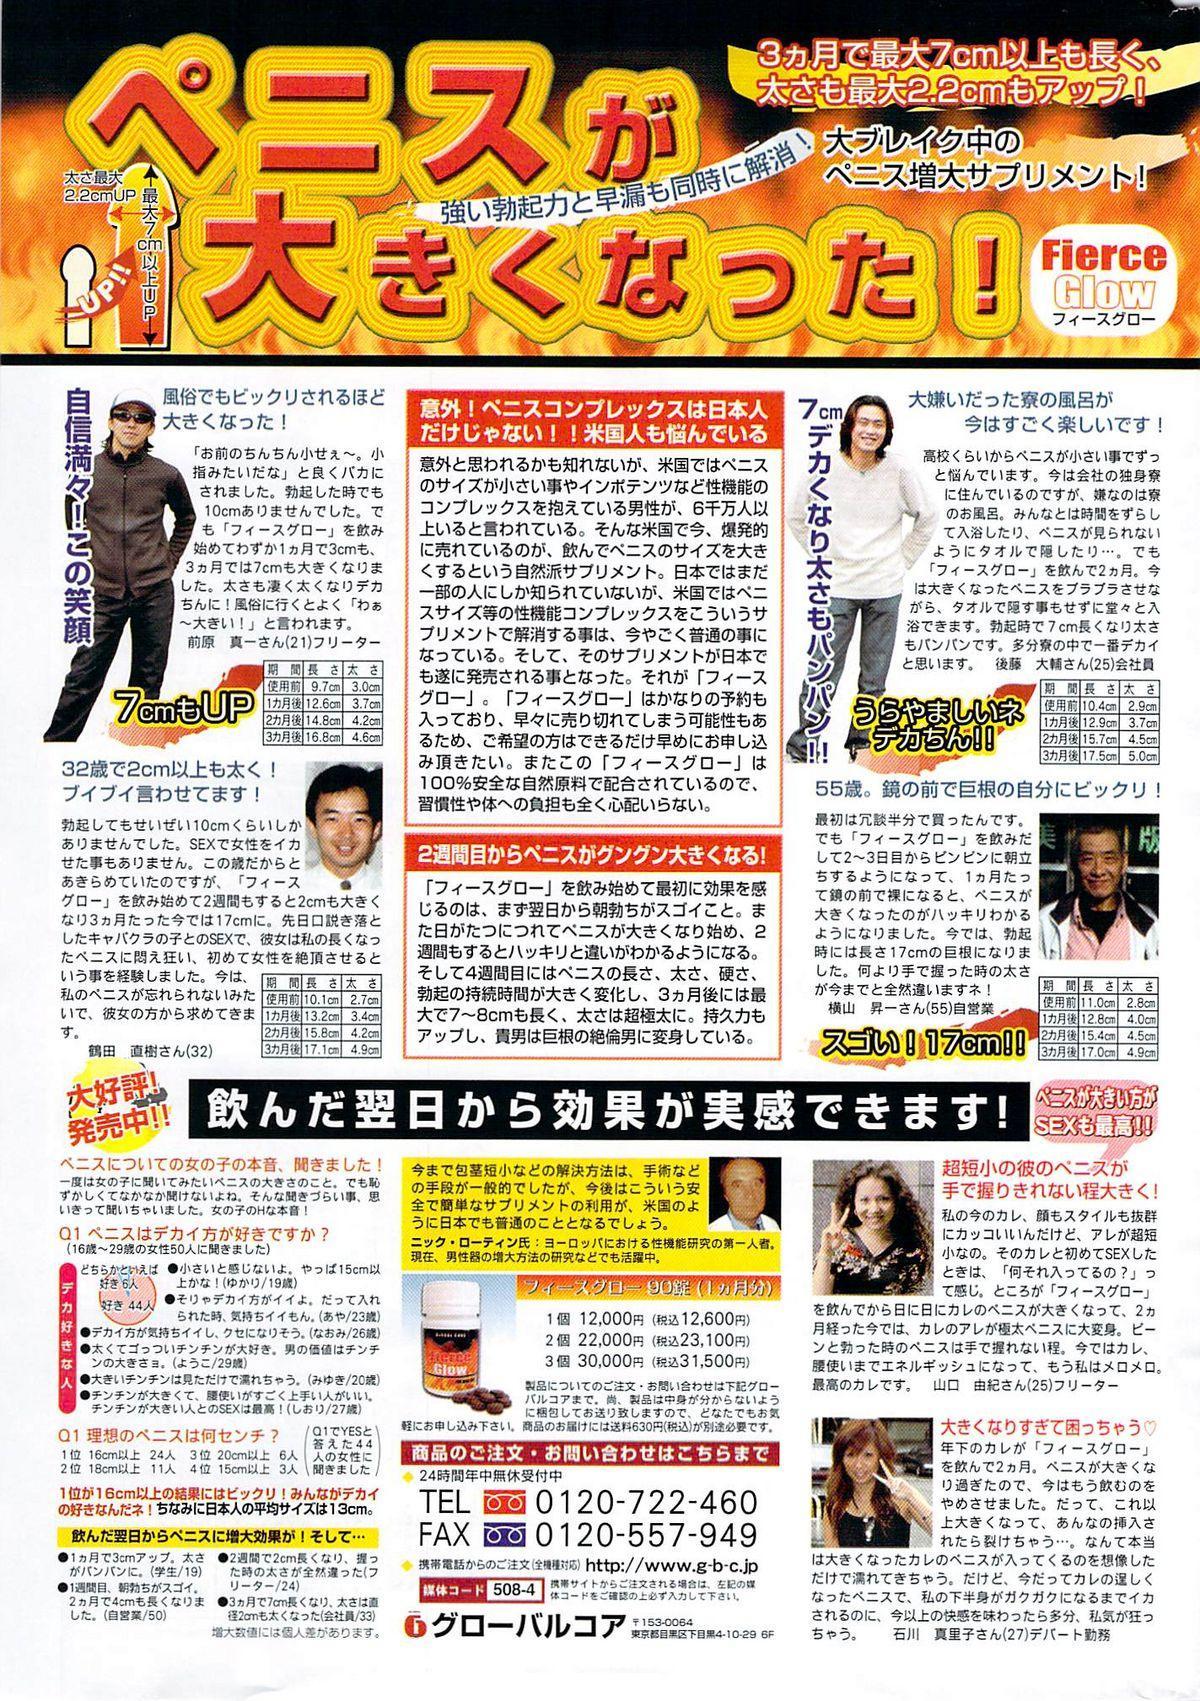 Monthly Vitaman 2007-08 278